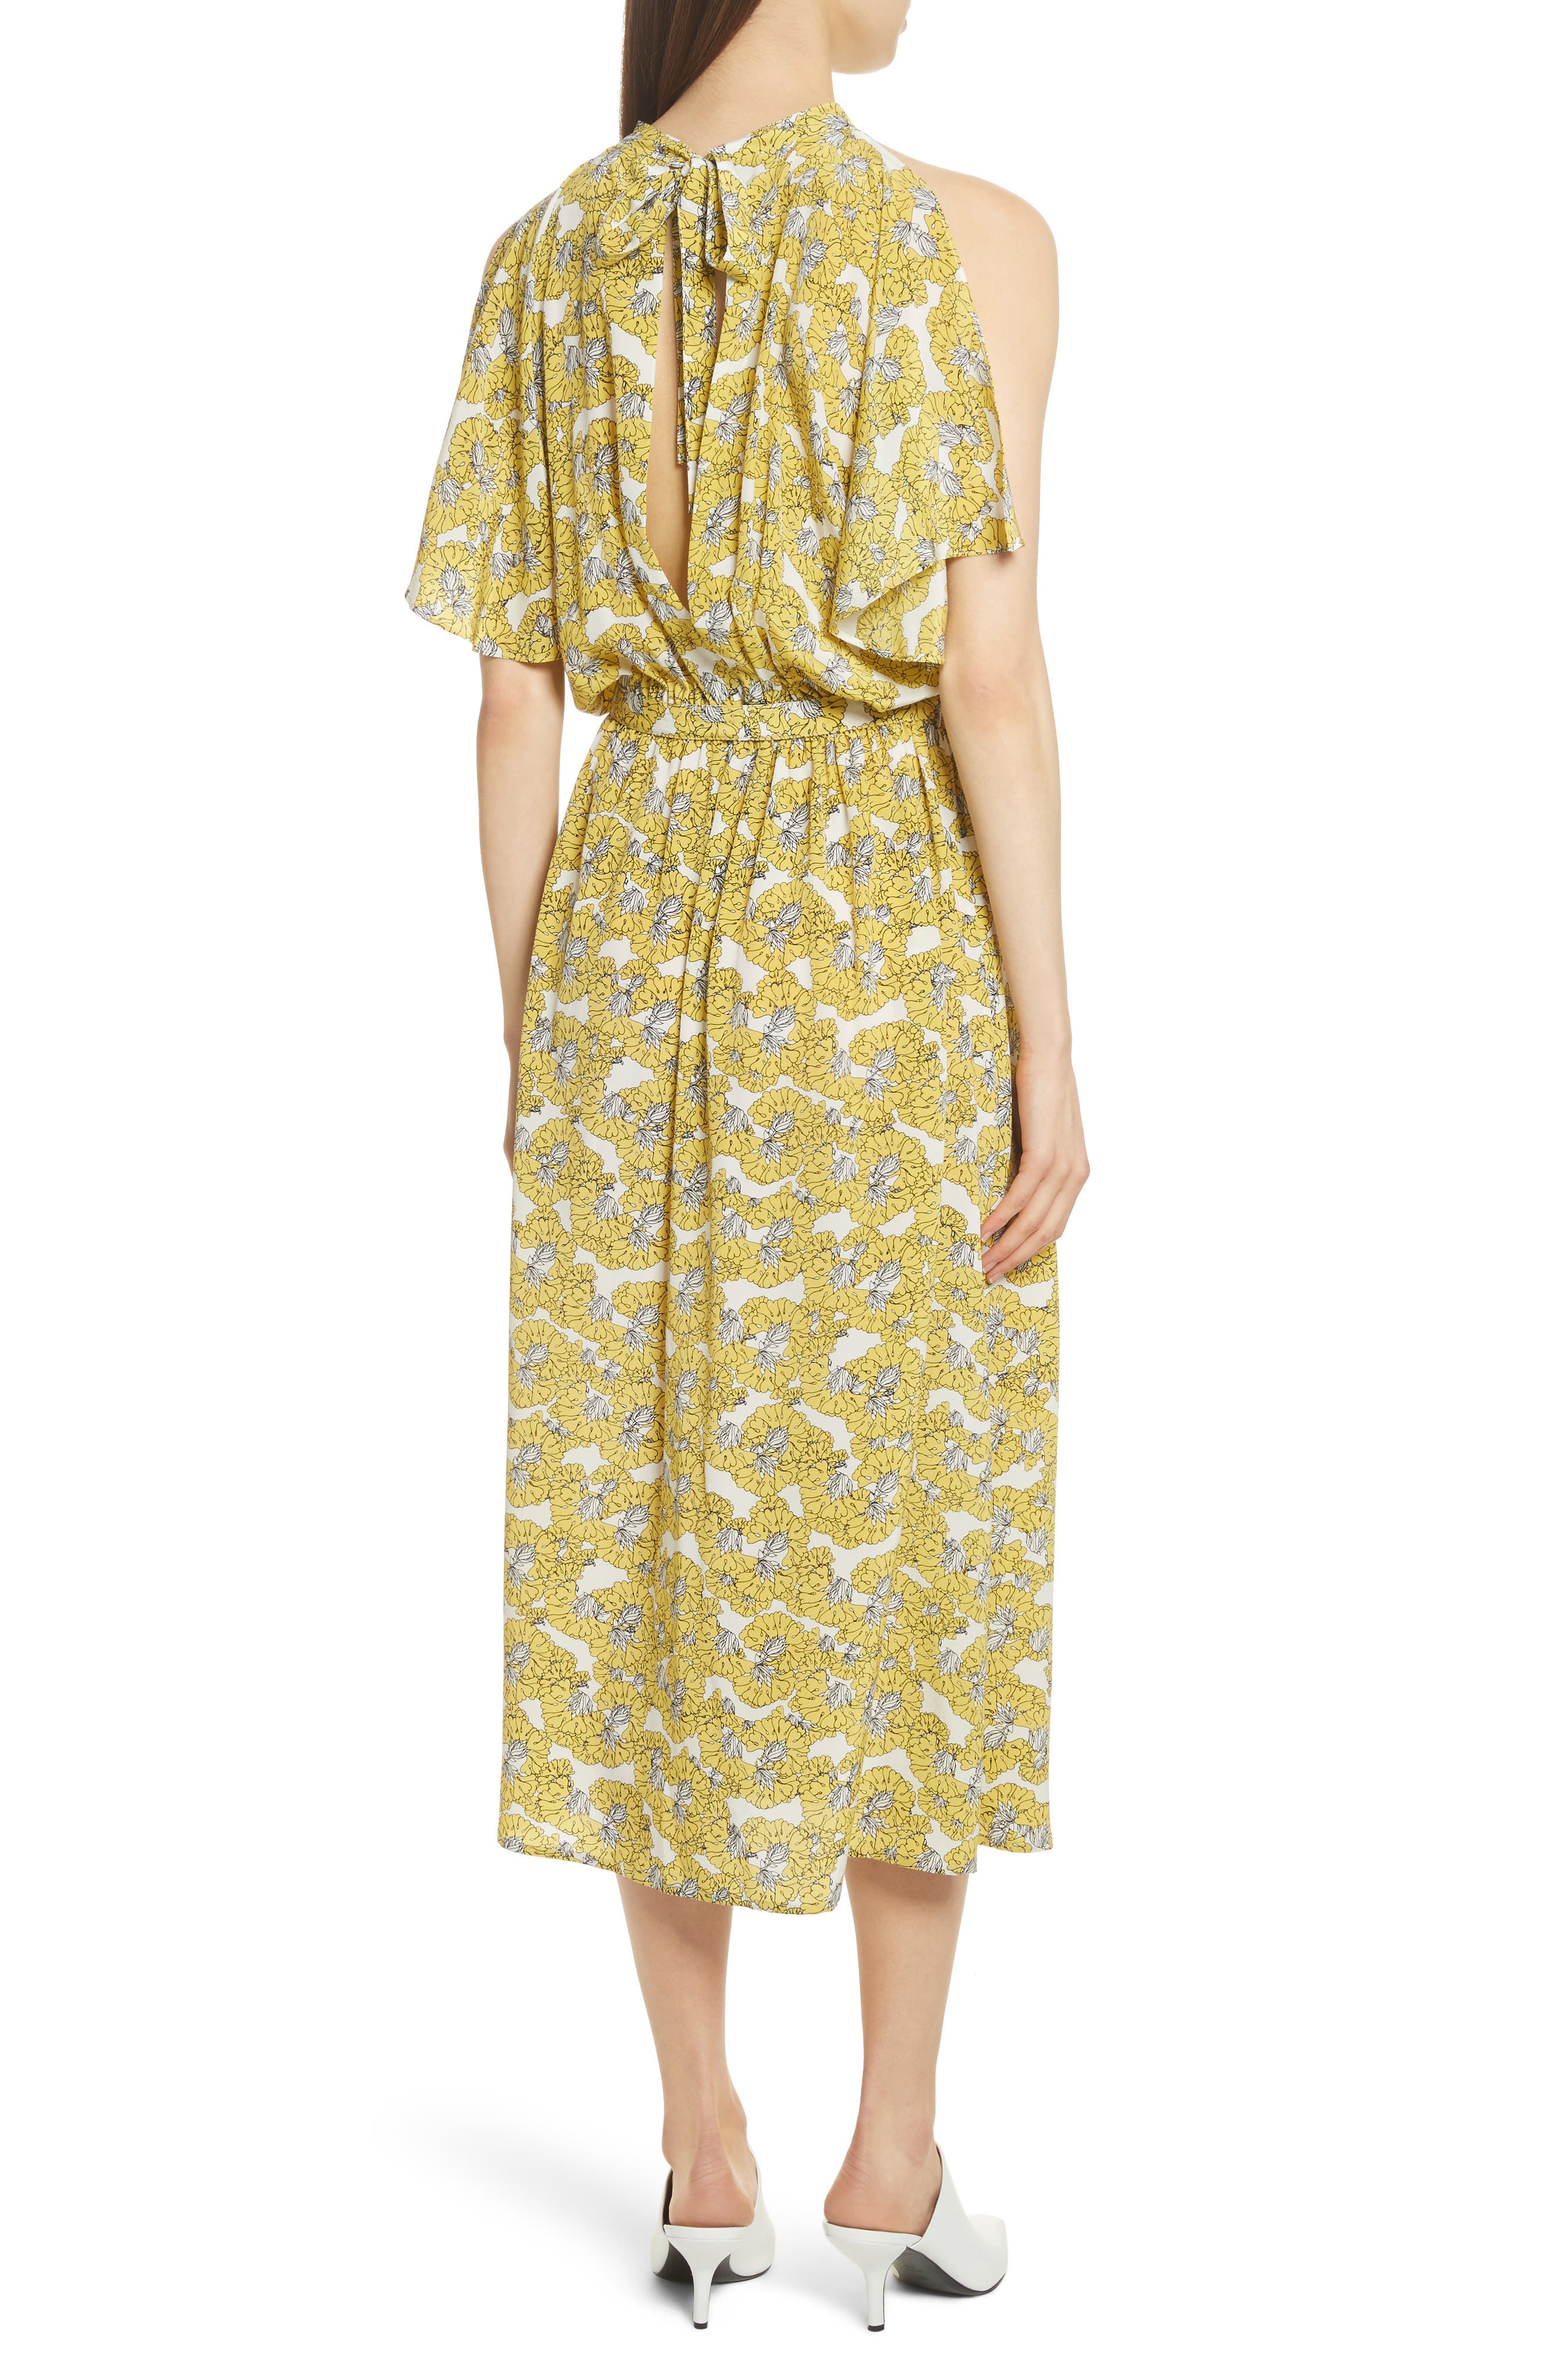 Dania Floral Print Dress,                             Alternate thumbnail 2, color,                             730